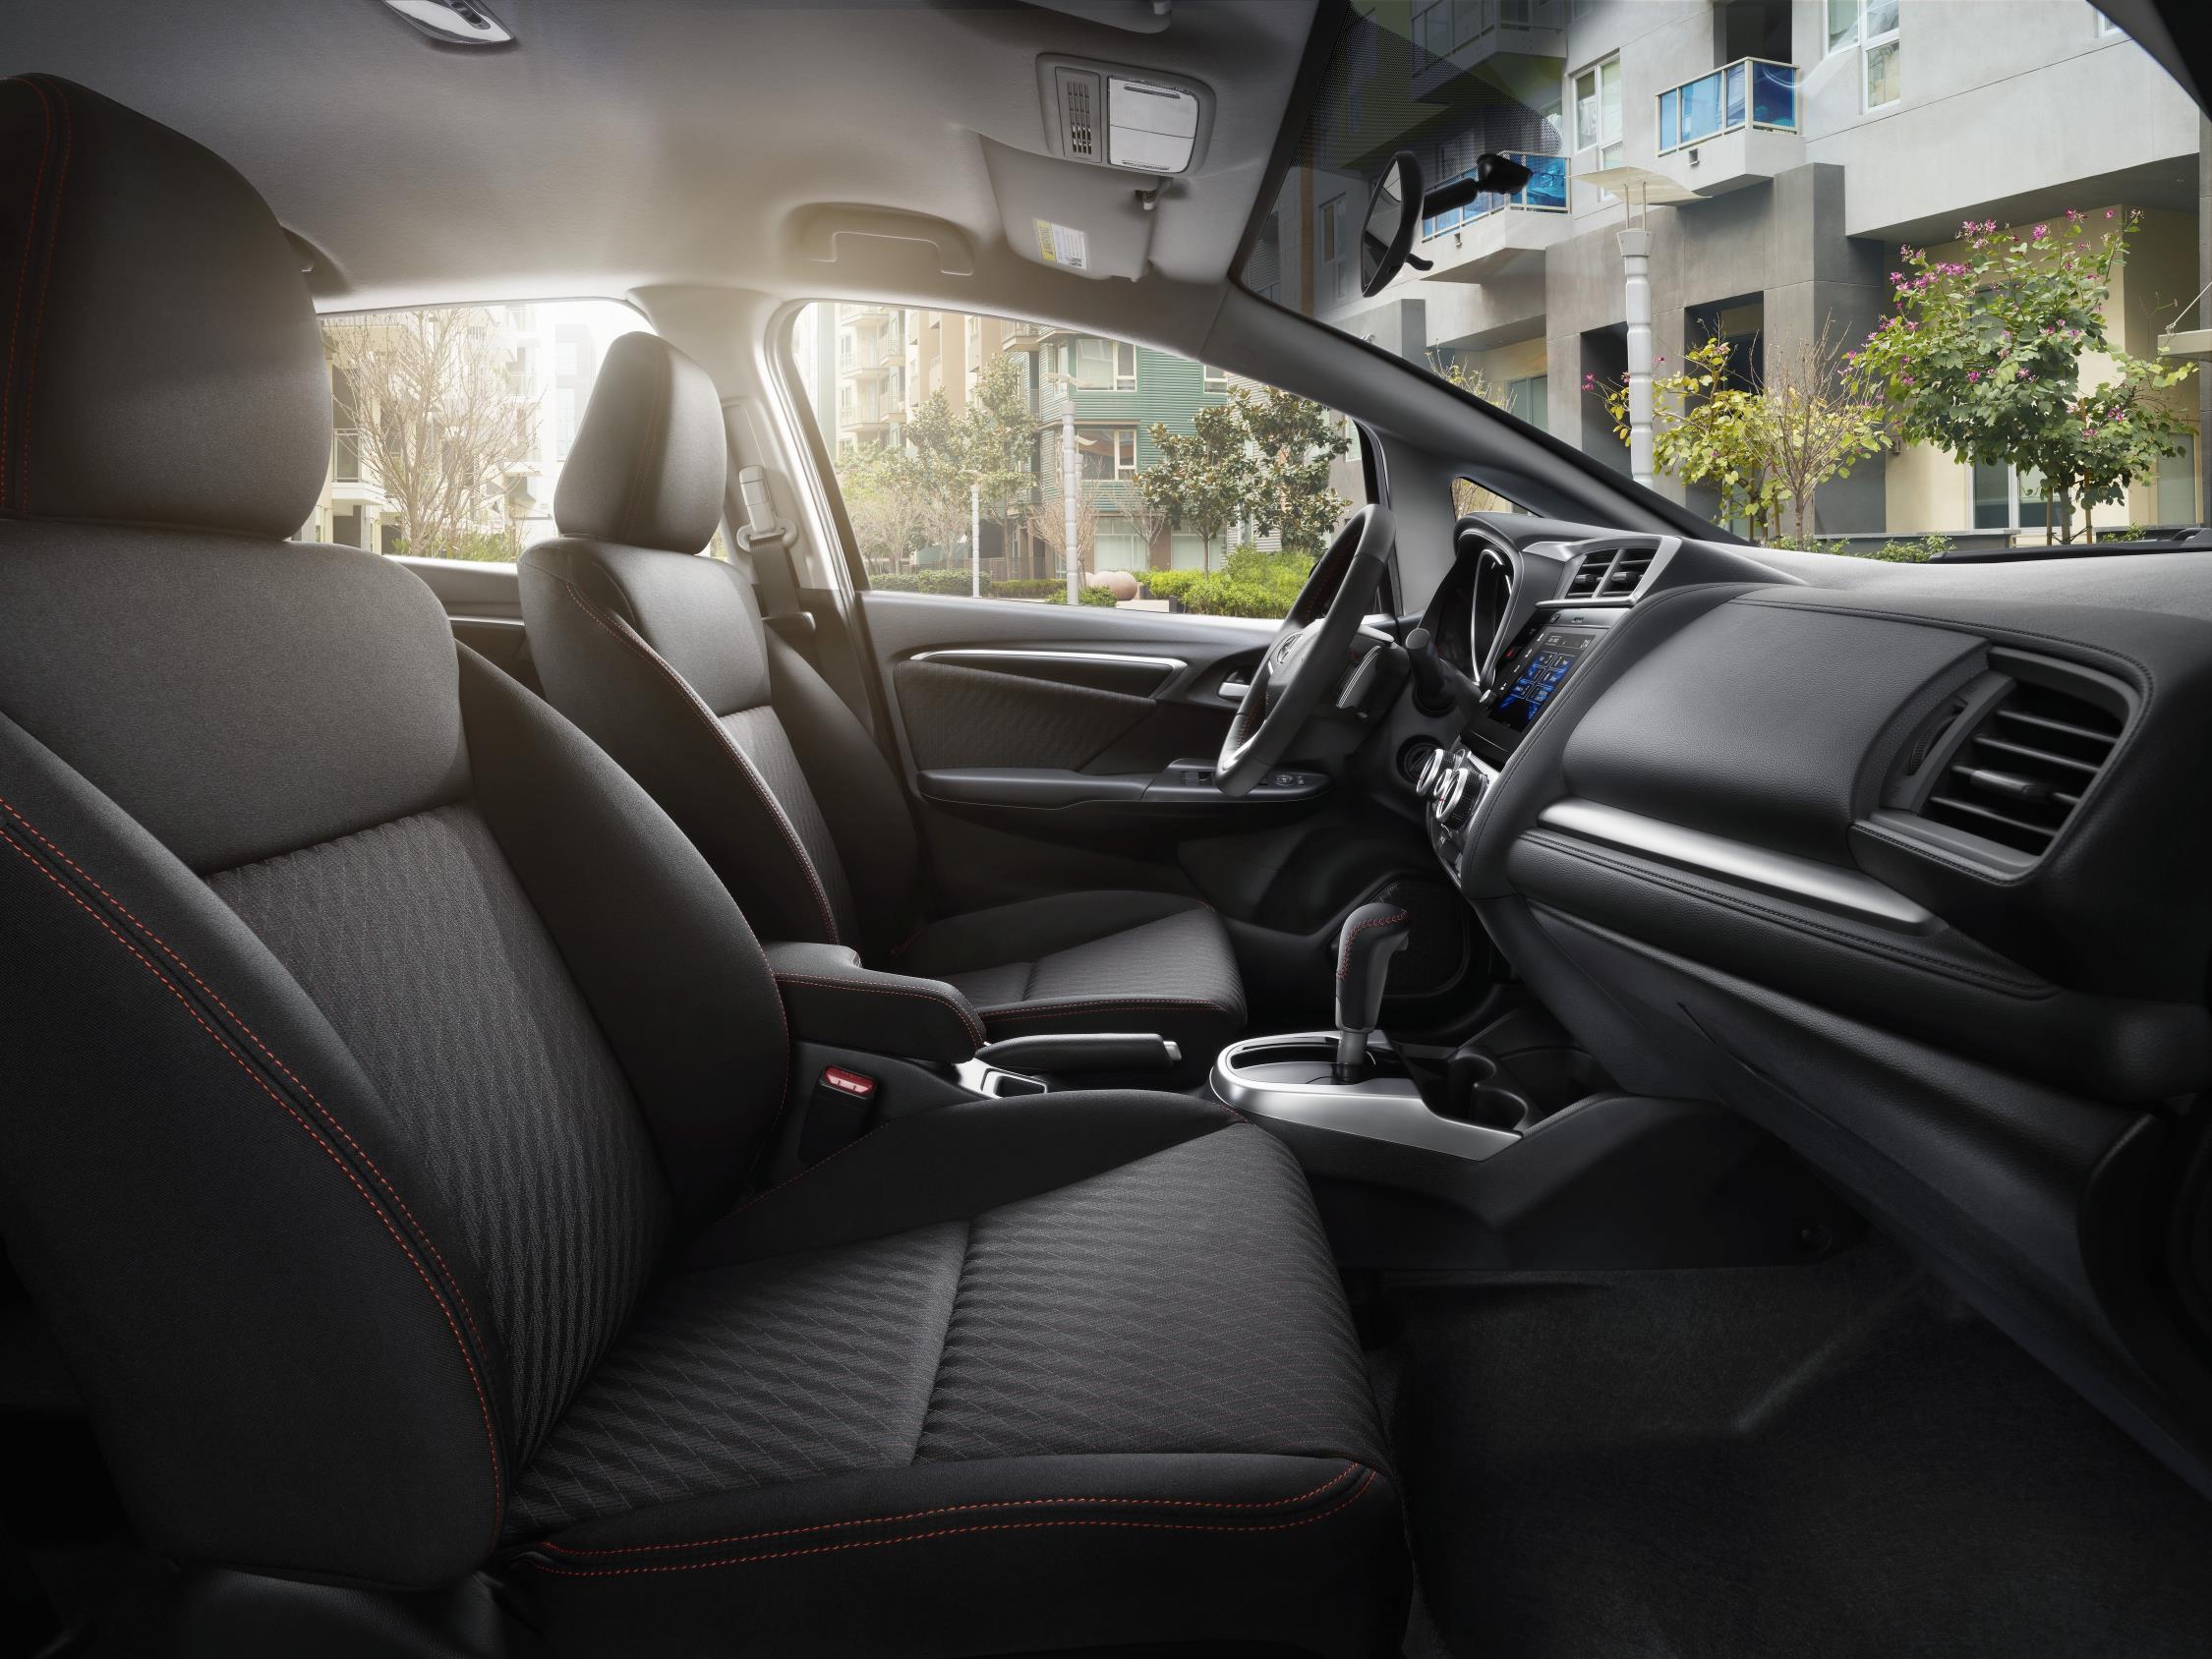 2018 HONDA FIT myAutoWorld